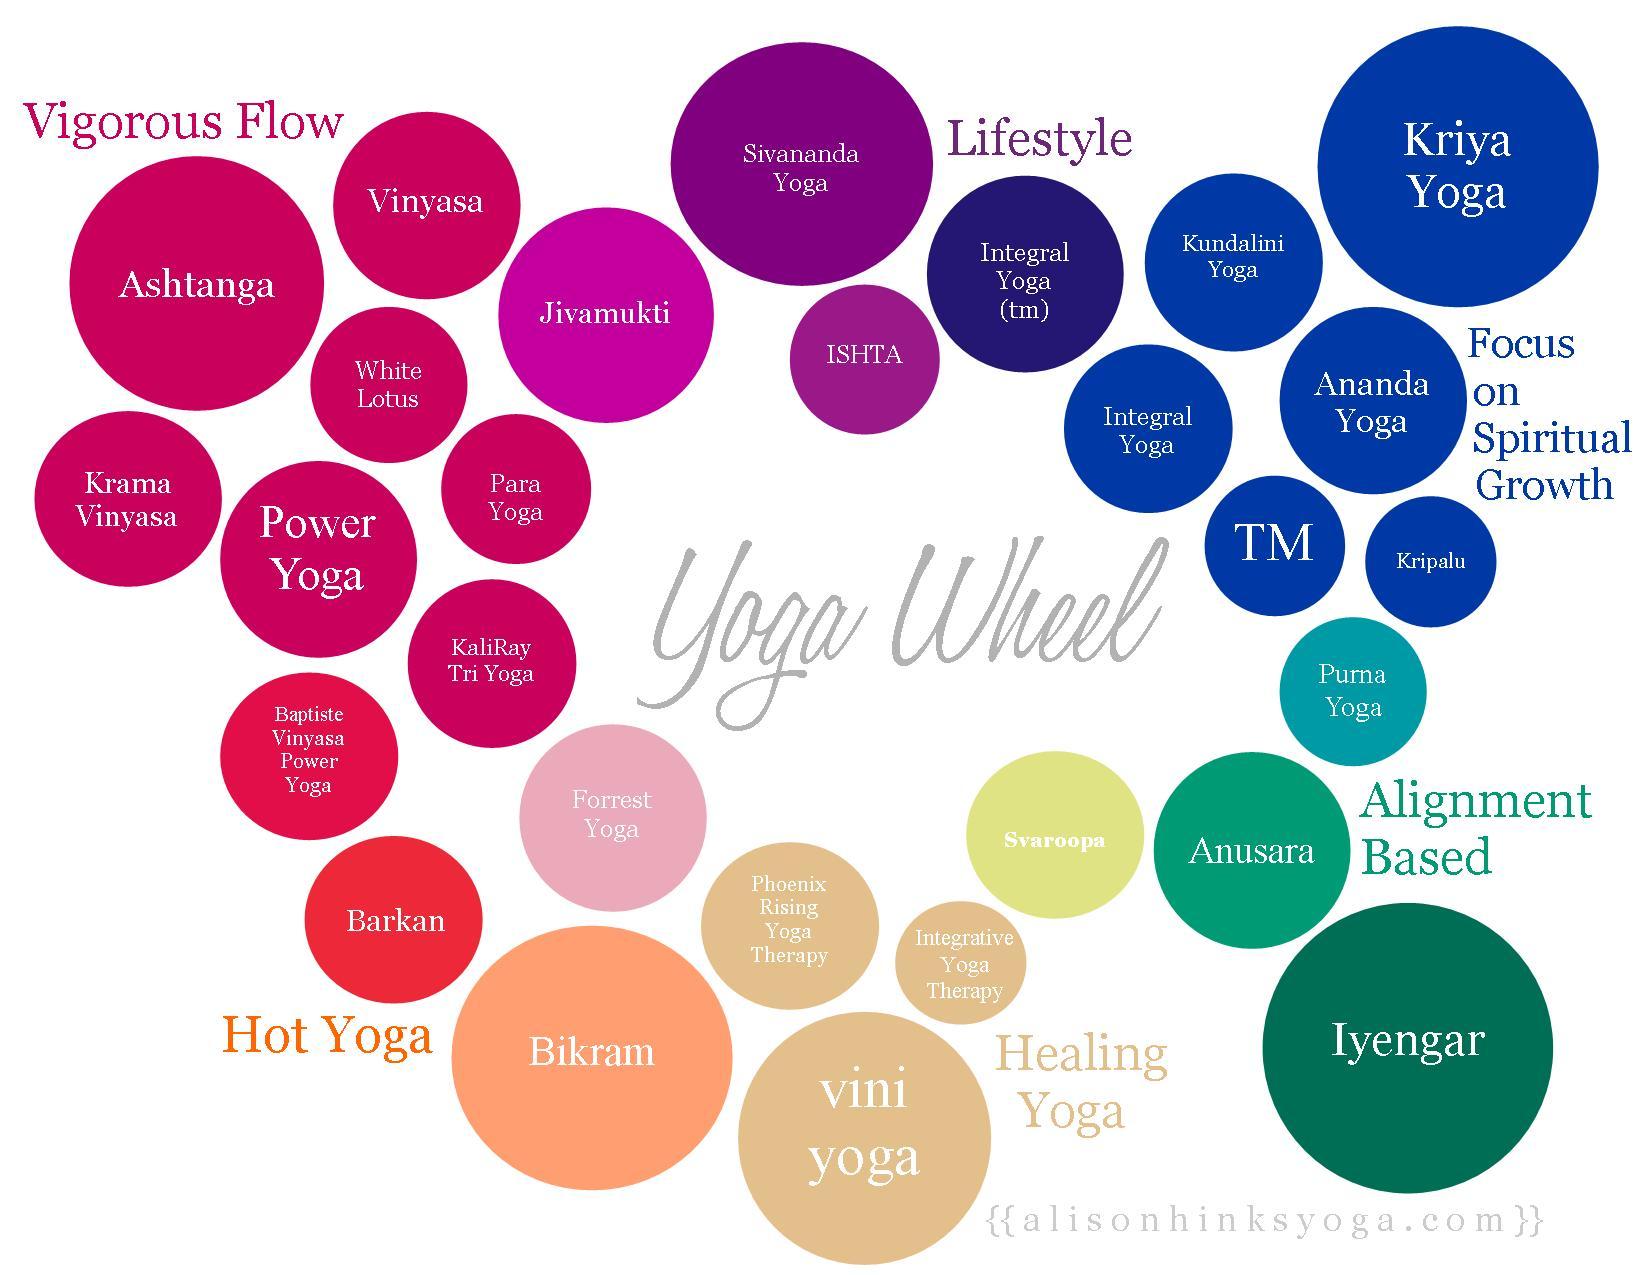 Upama Yoga Concluding Module 3 Philosophy Beginning Module 4